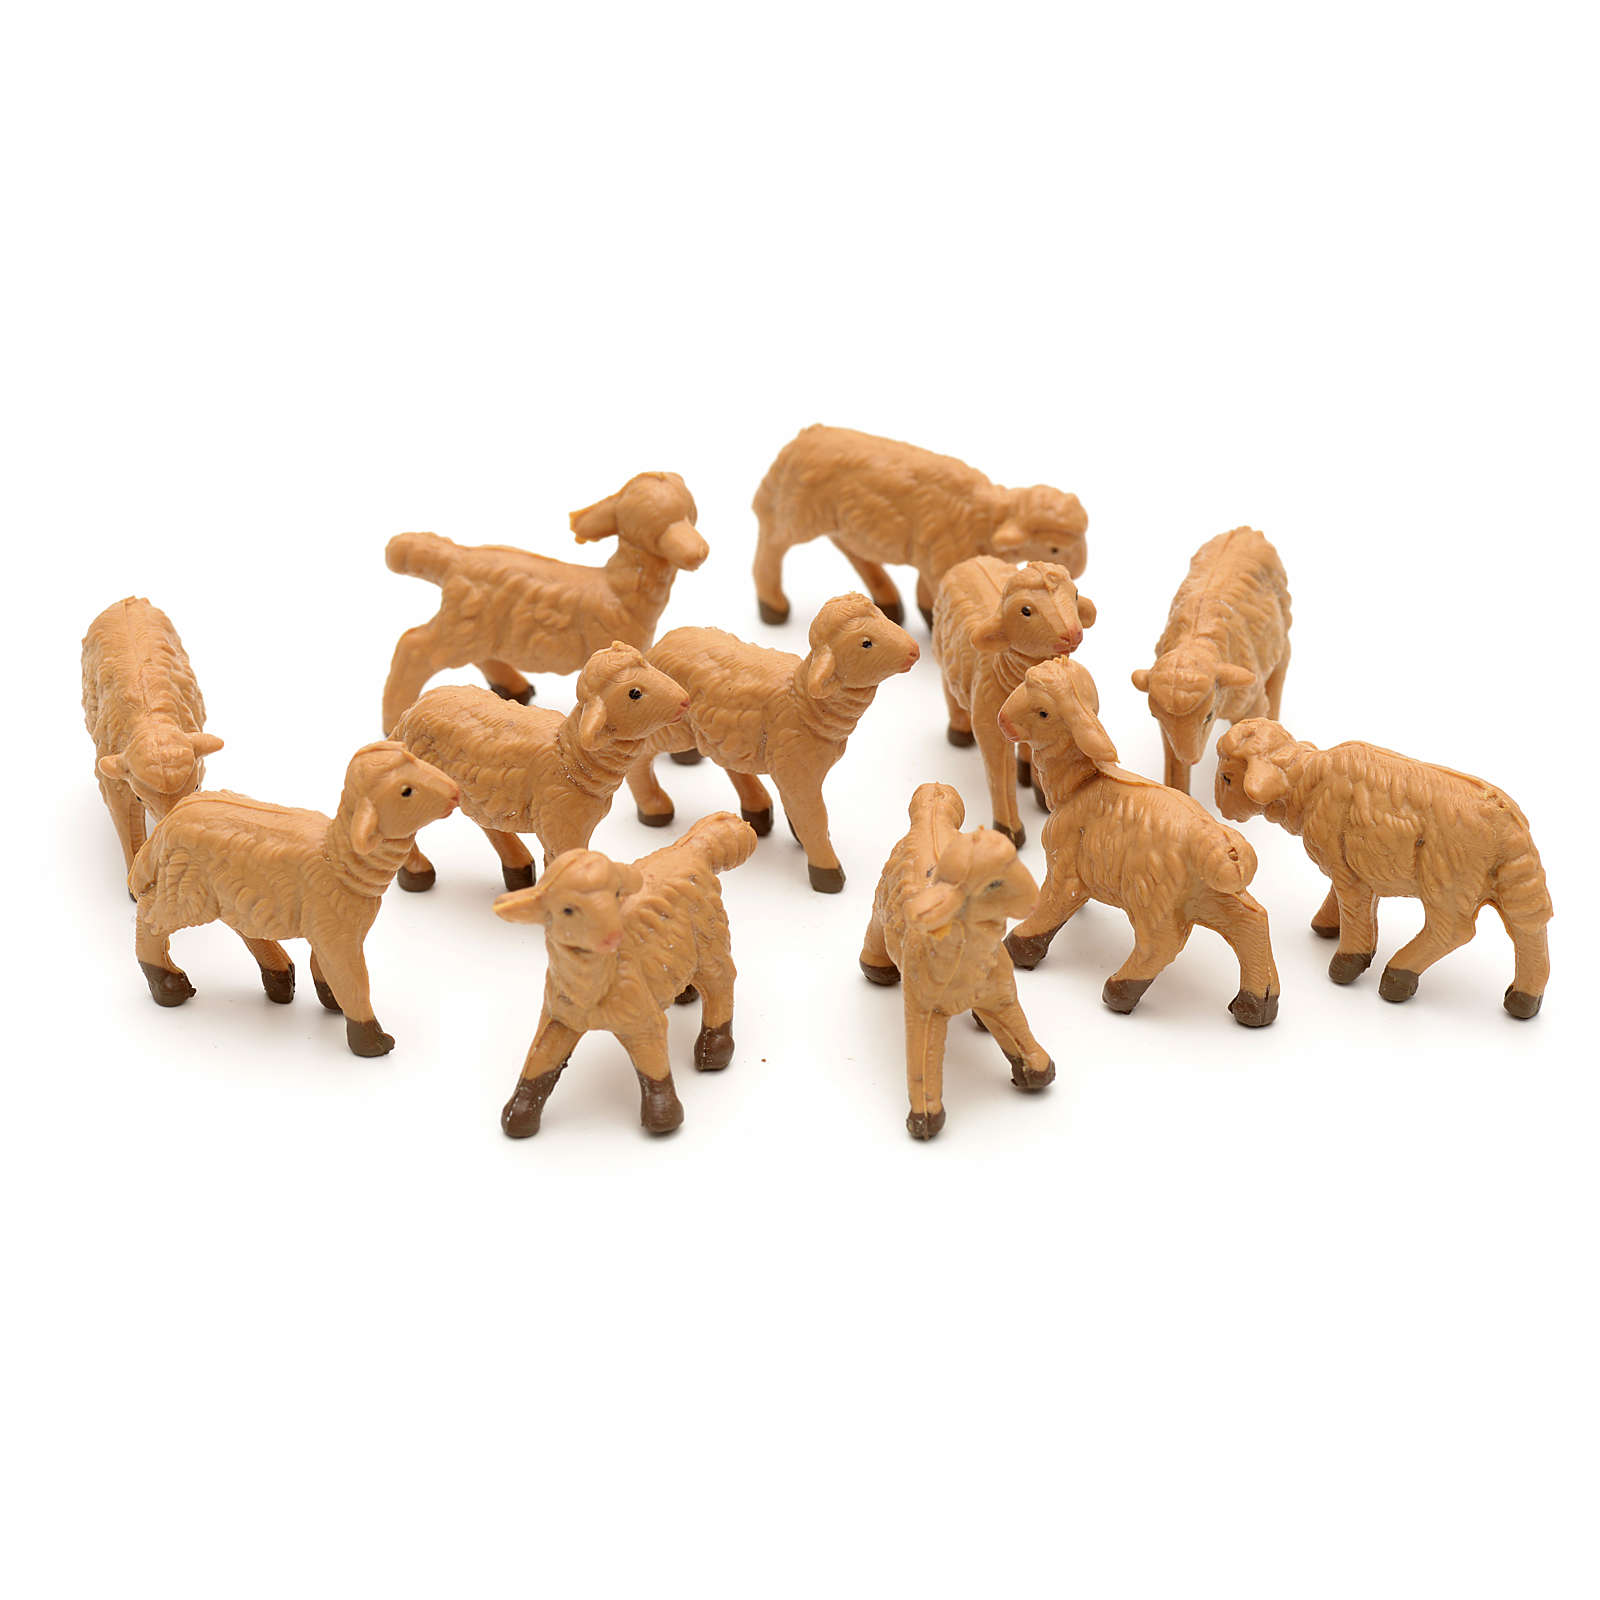 Owce różne 12 szt 6.5 cm Fontanini 4